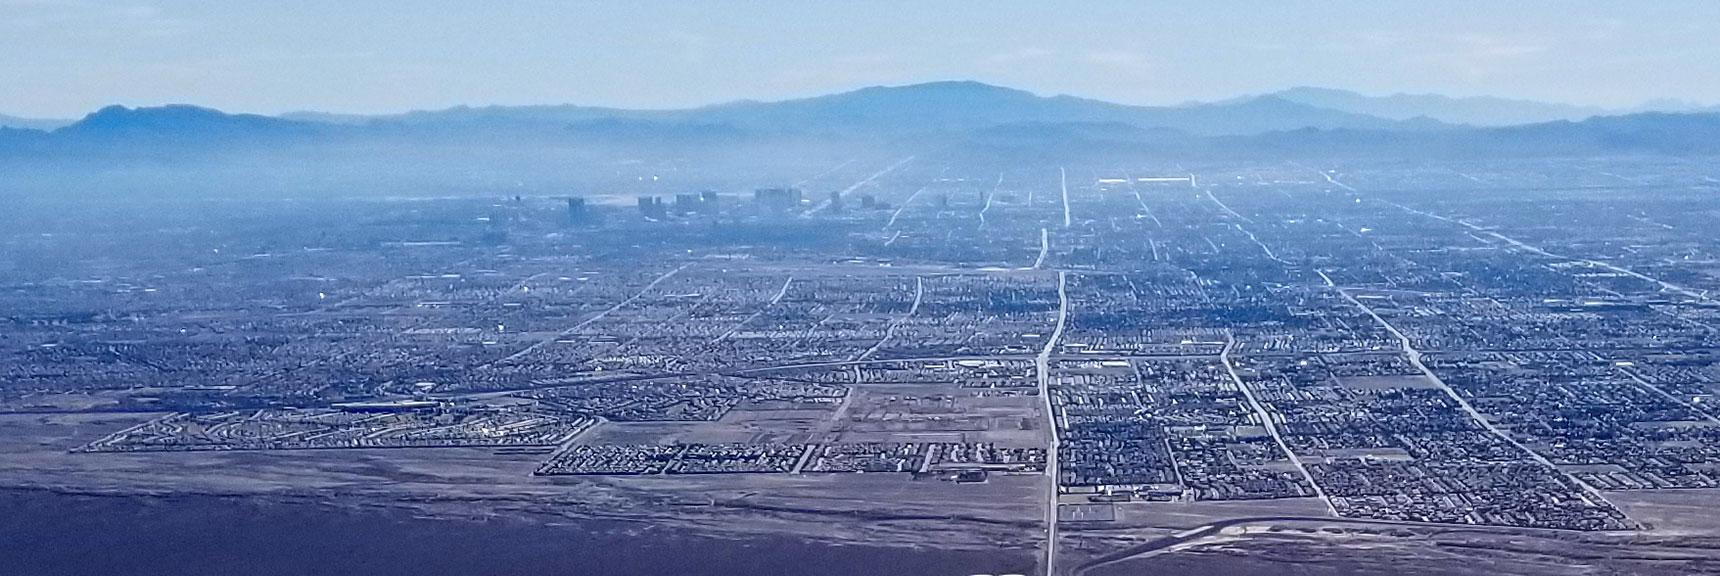 Las Vegas Viewed from Gass Peak, Nevada